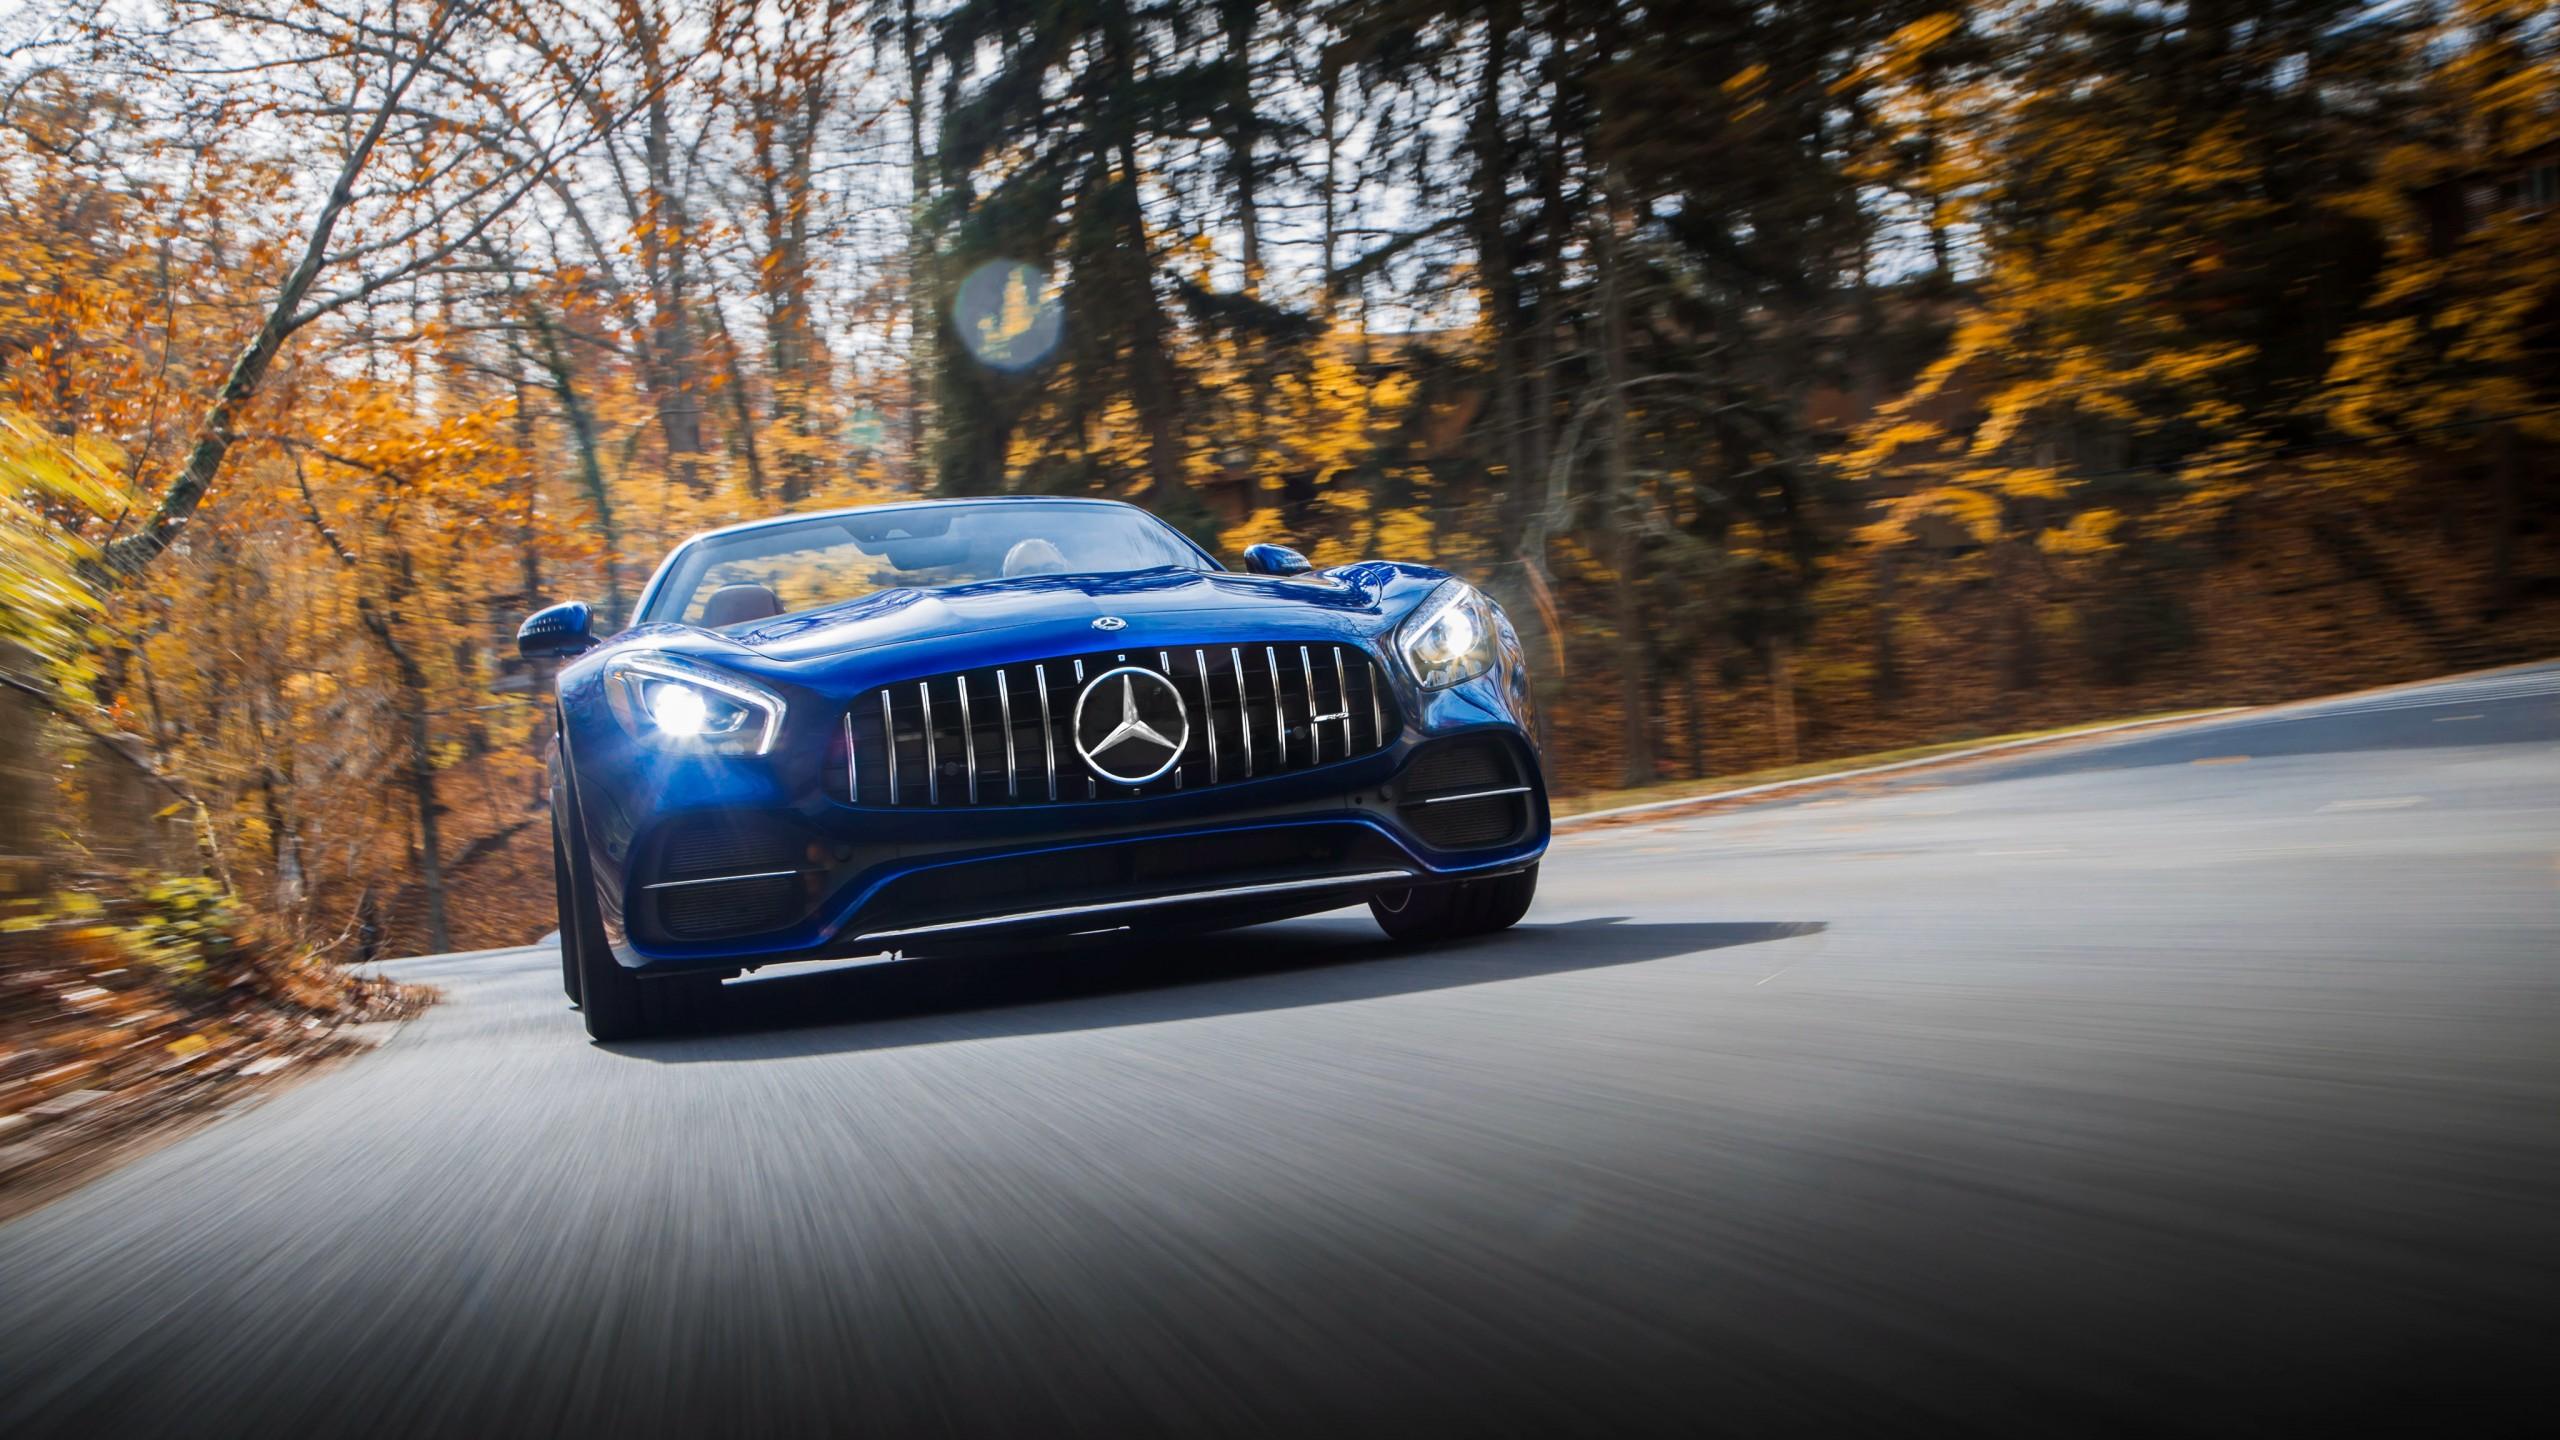 2018 Mercedes AMG GT C Roadster 4K 3 Wallpaper HD Car